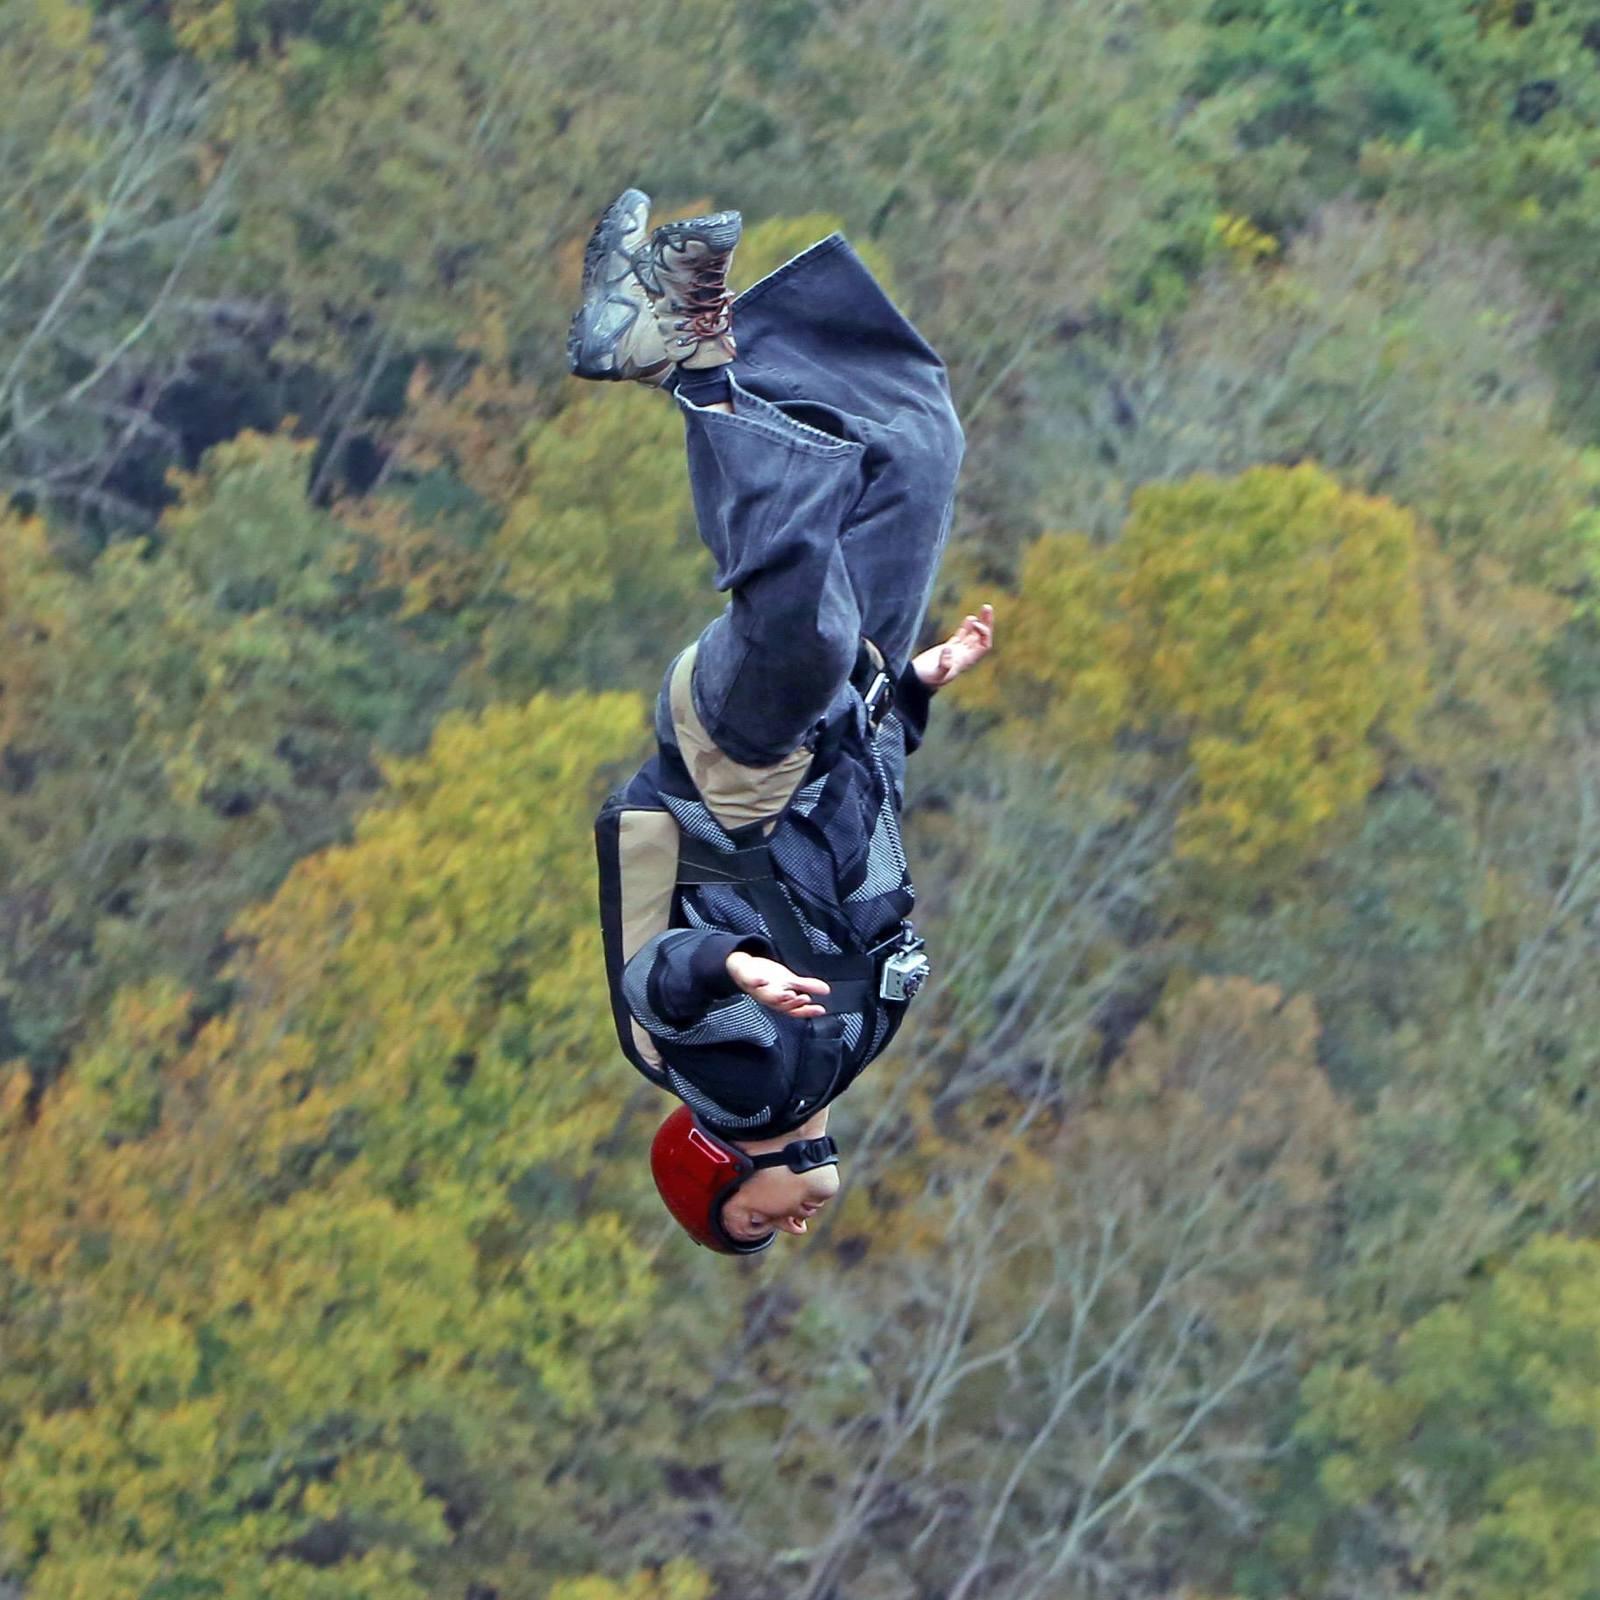 First BASE jump